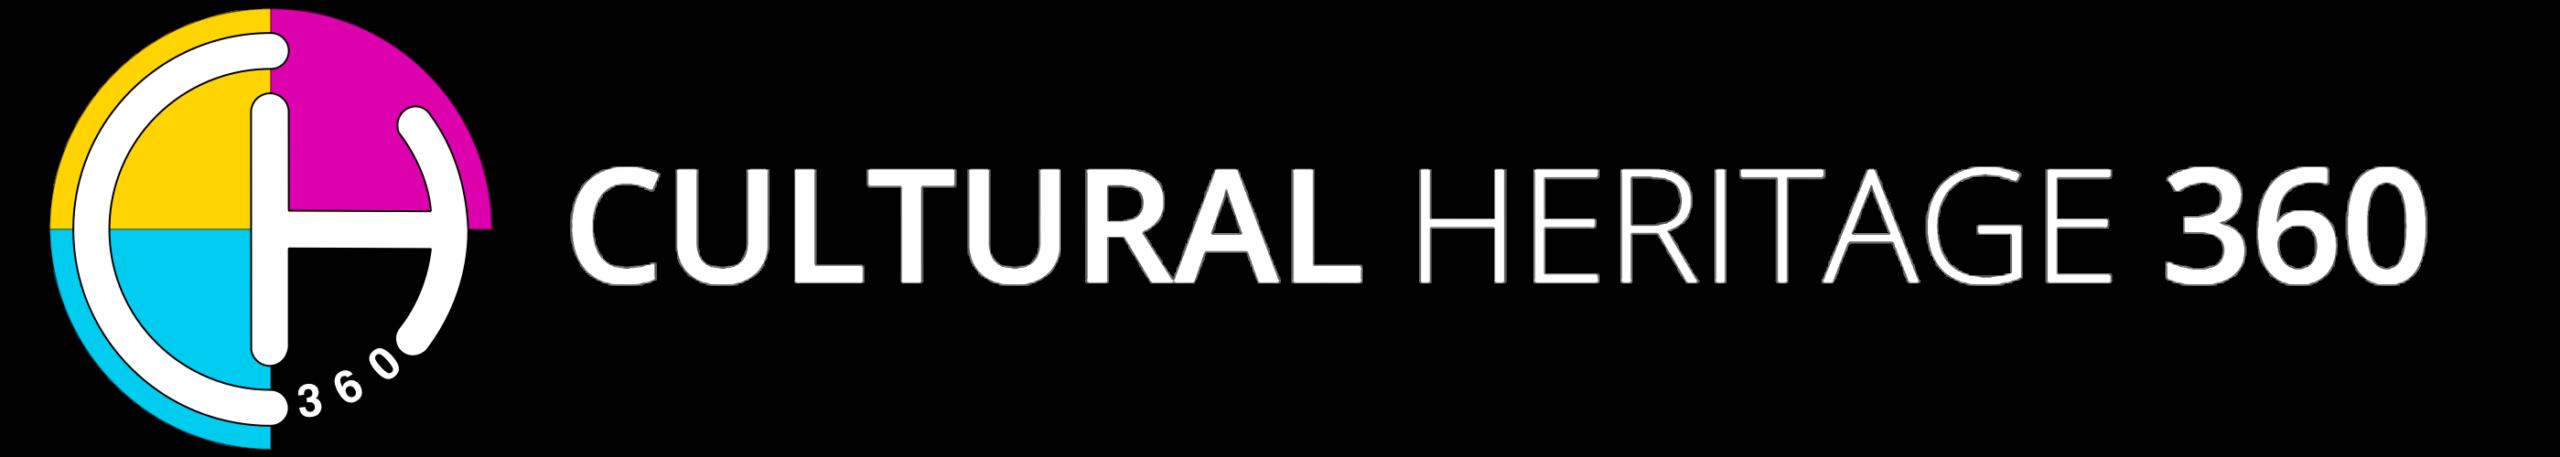 Cultural Heritage 360